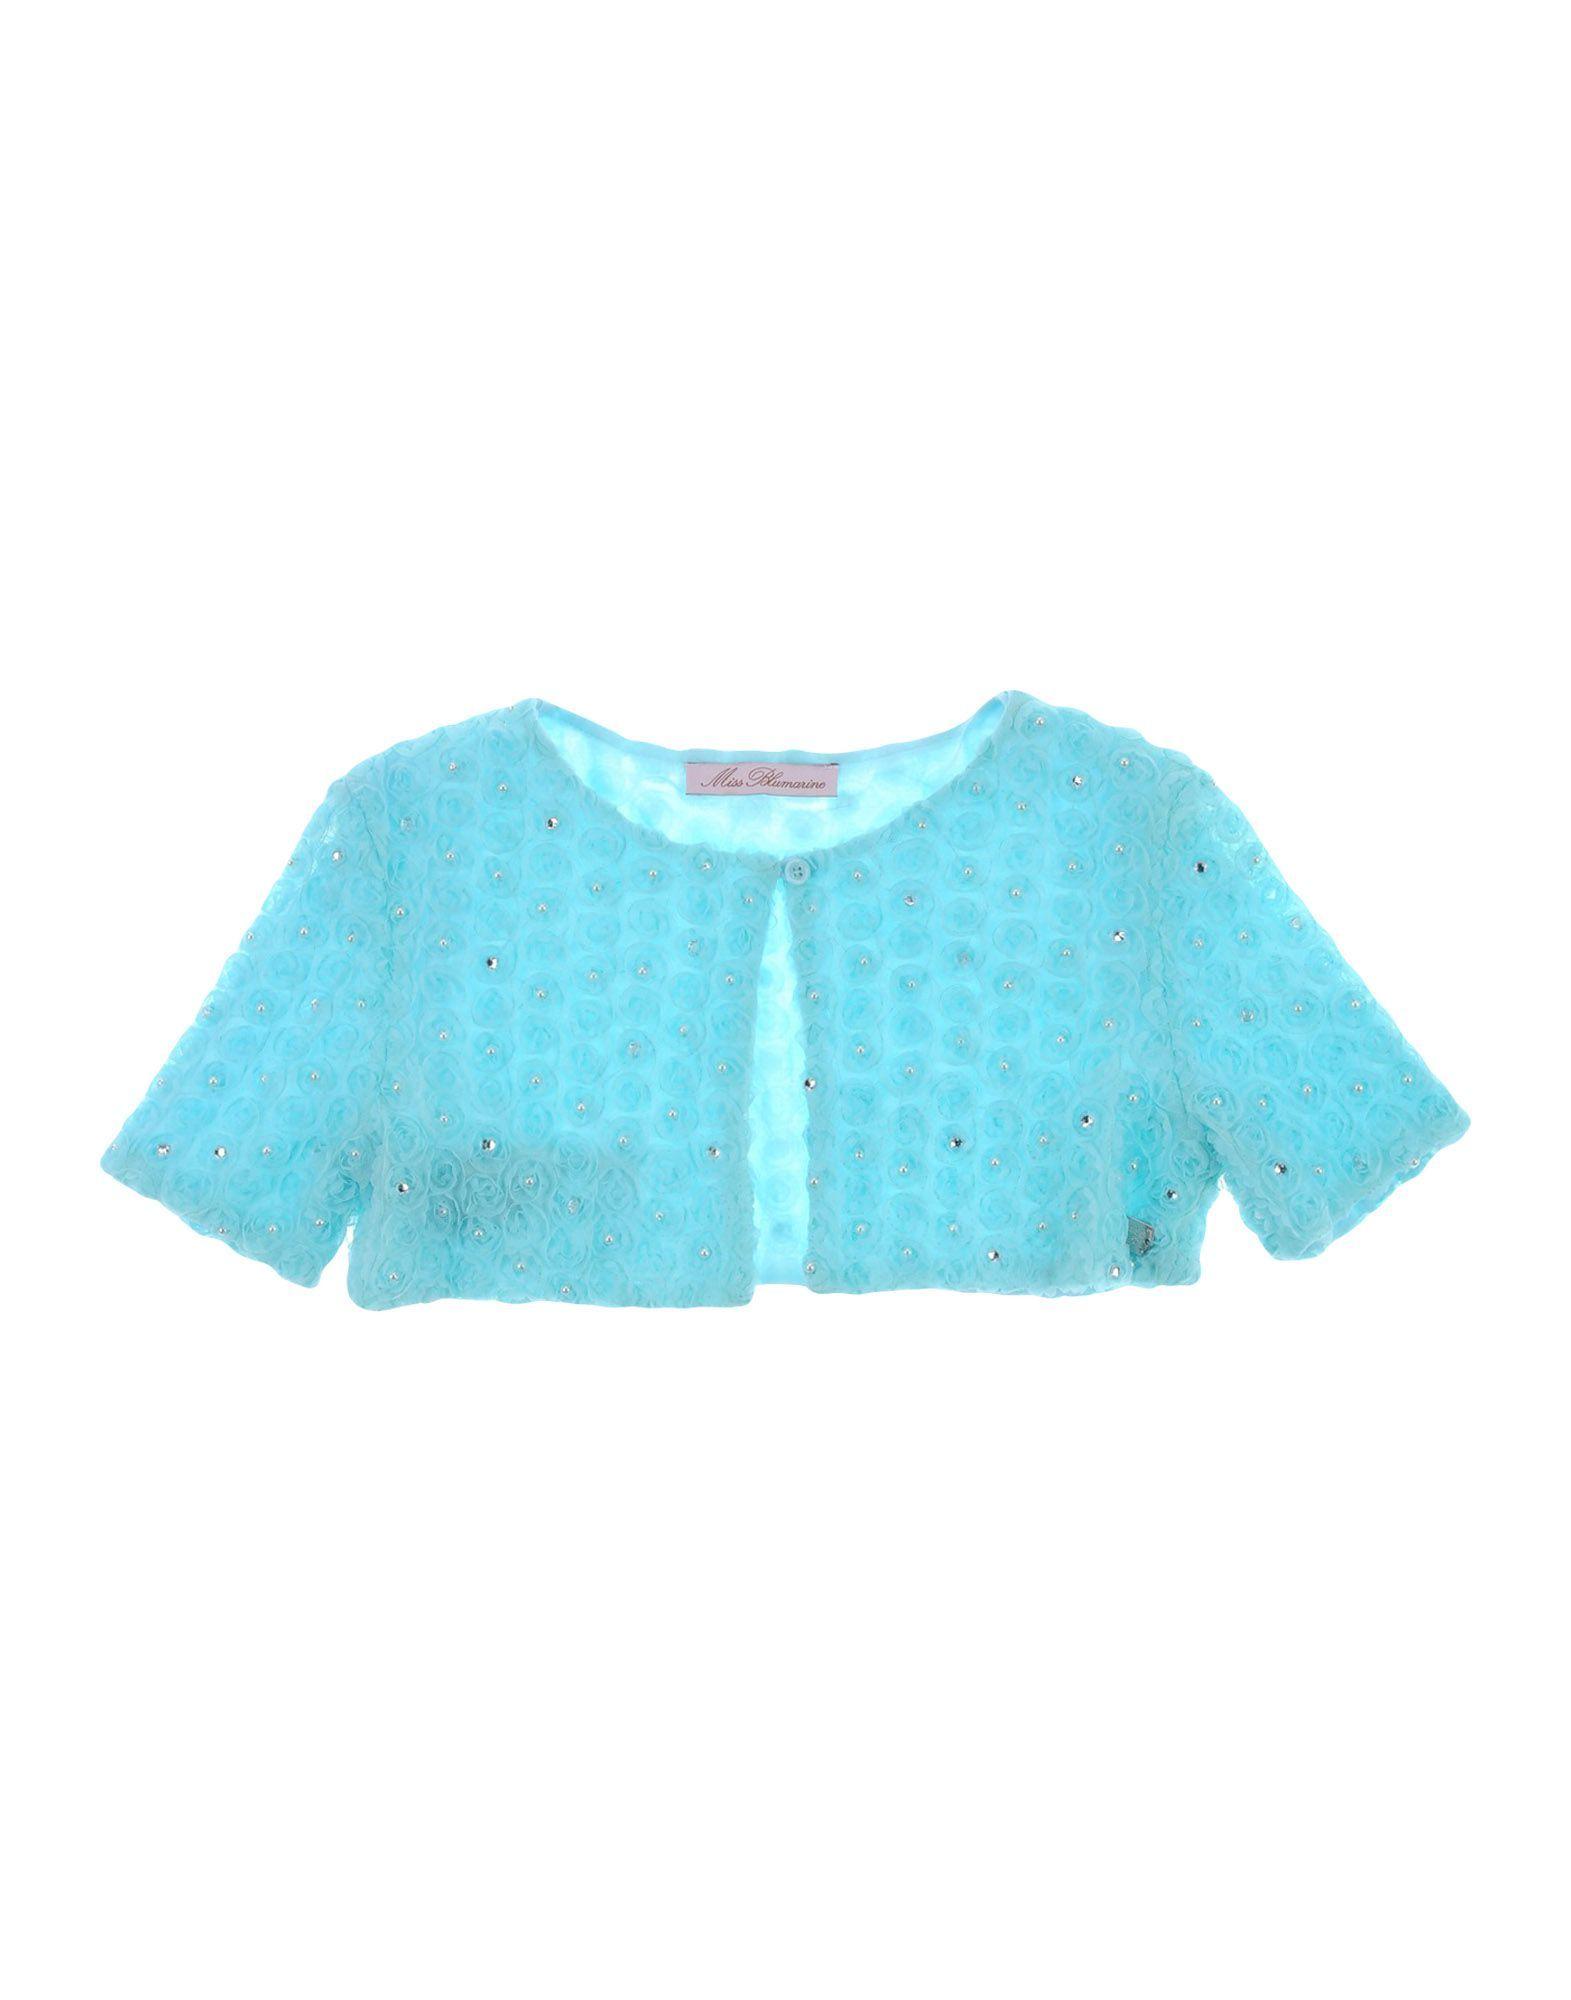 KNITWEAR Miss Blumarine Turquoise Girl Polyester